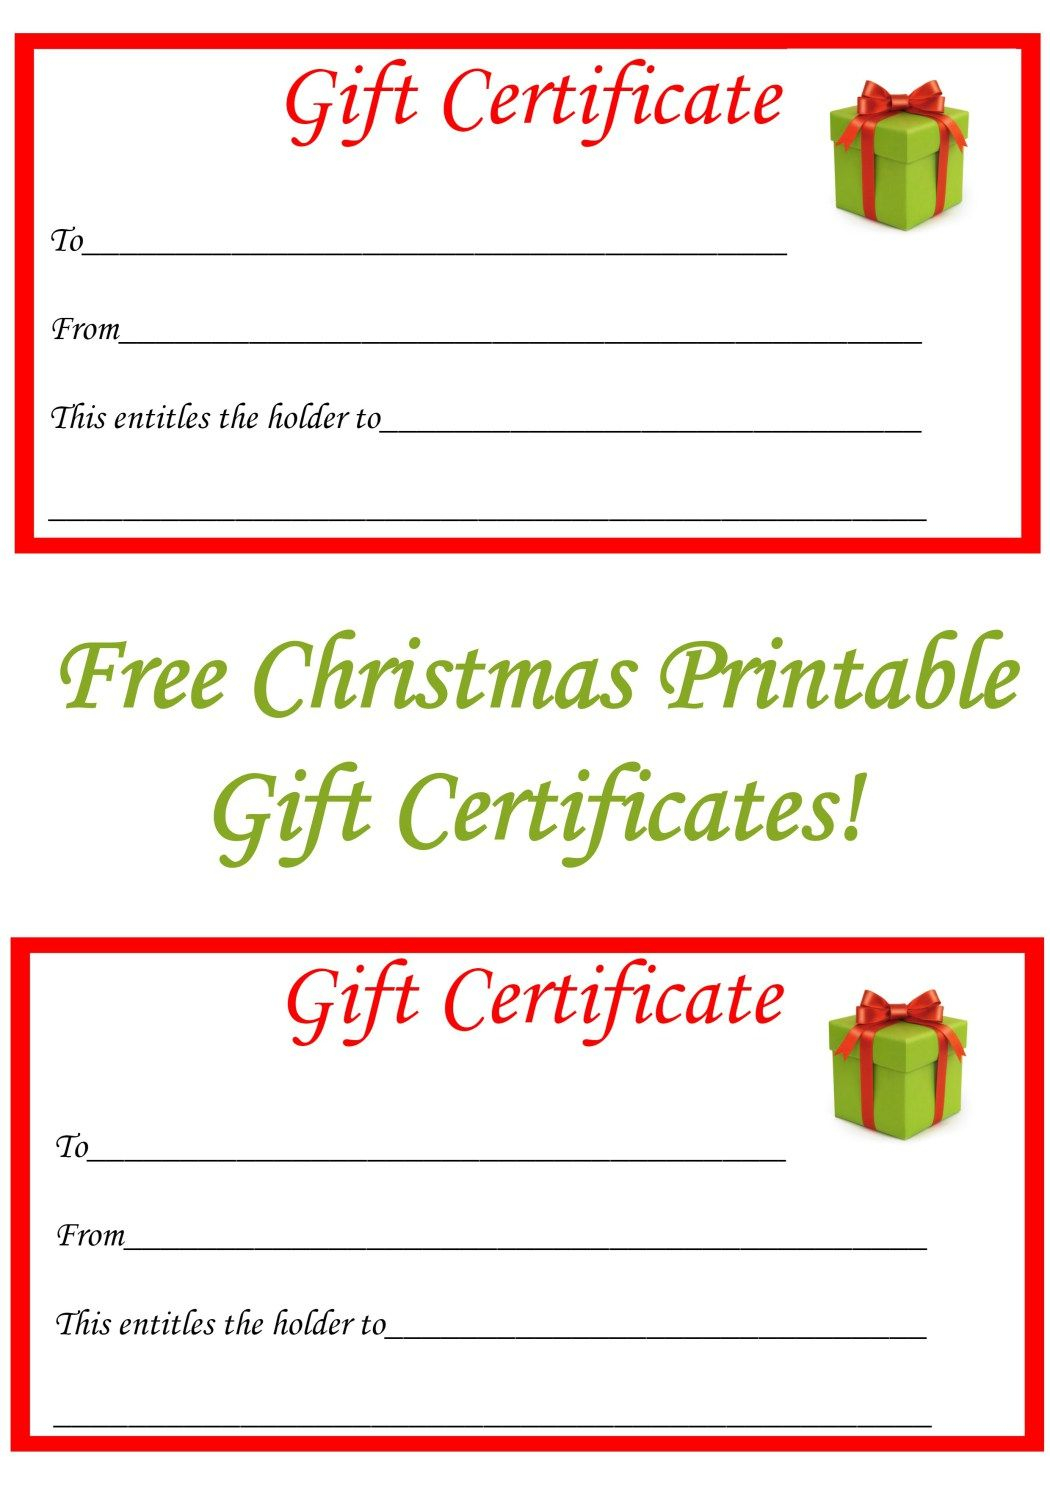 Free Christmas Printable Gift Certificates | Gift Ideas With Regard To Printable Gift Certificates Templates Free